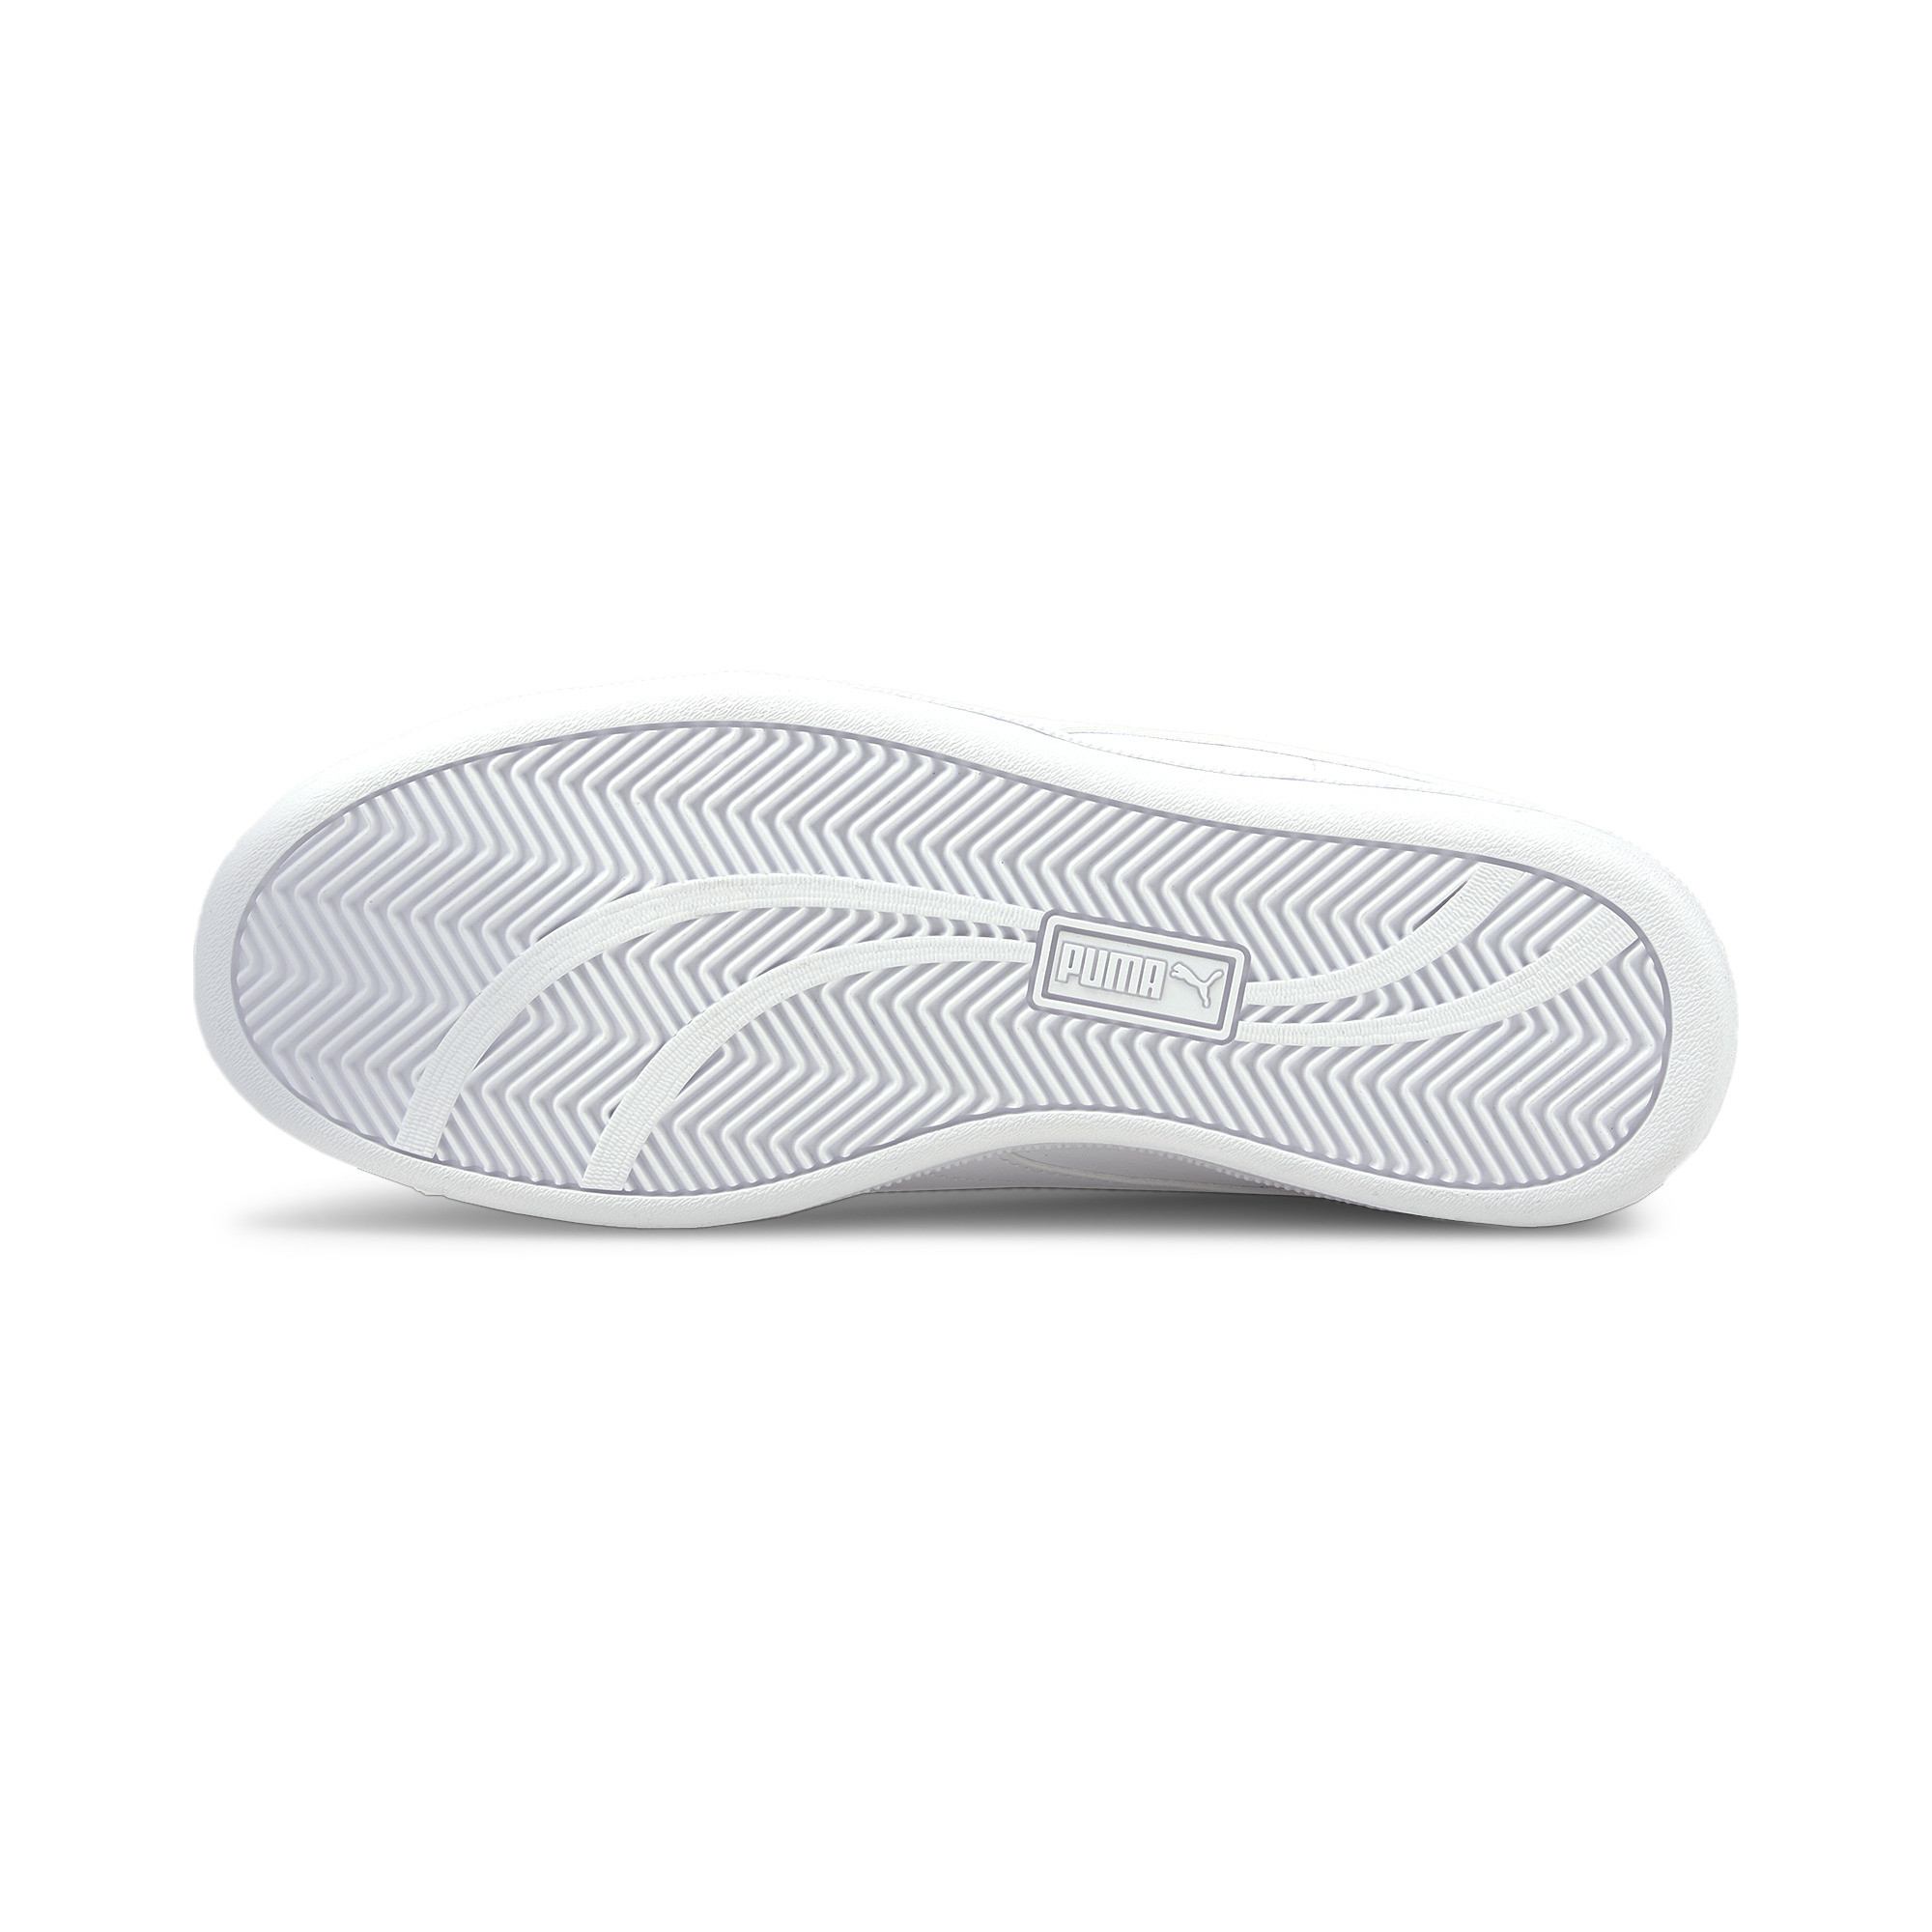 PUMA-Smash-Trainers-Schuhe-Sneakers-Sport-Classics-Unisex-Neu Indexbild 15